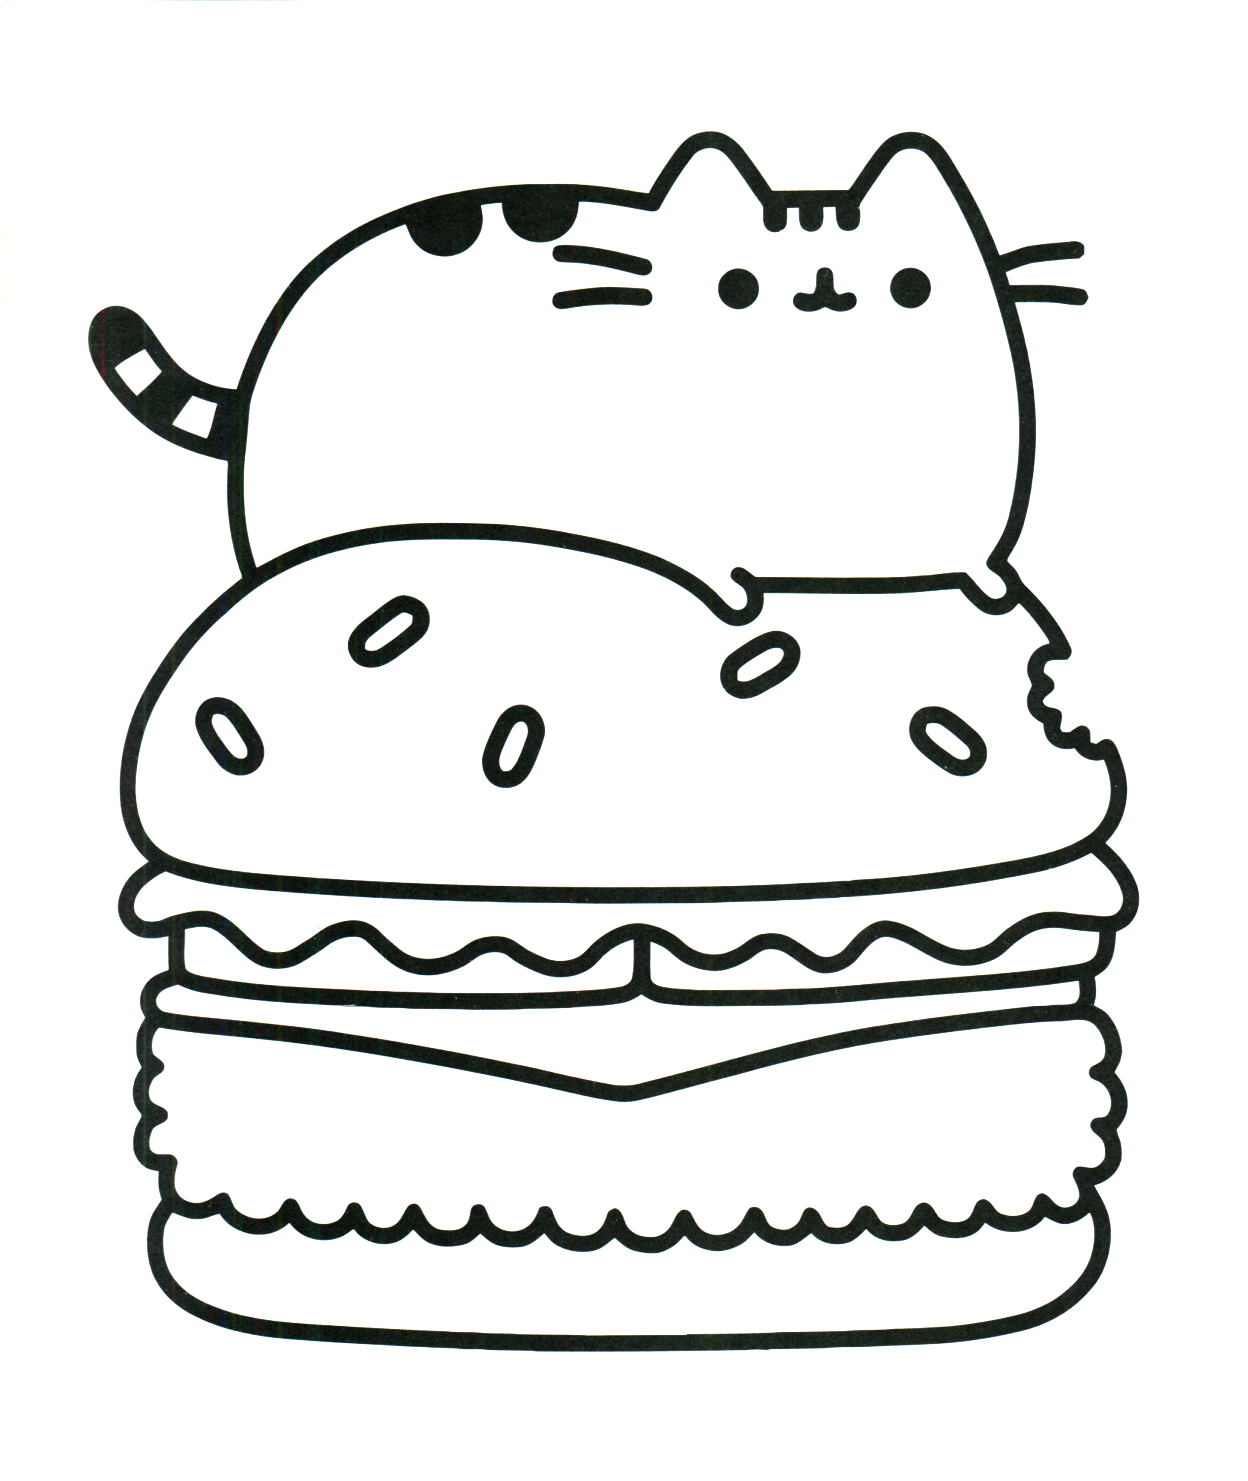 Kittyburger Kawaii Coloring Pages Cartoon Coloring Pages Unicorn Coloring Pages Pusheen Coloring Pages